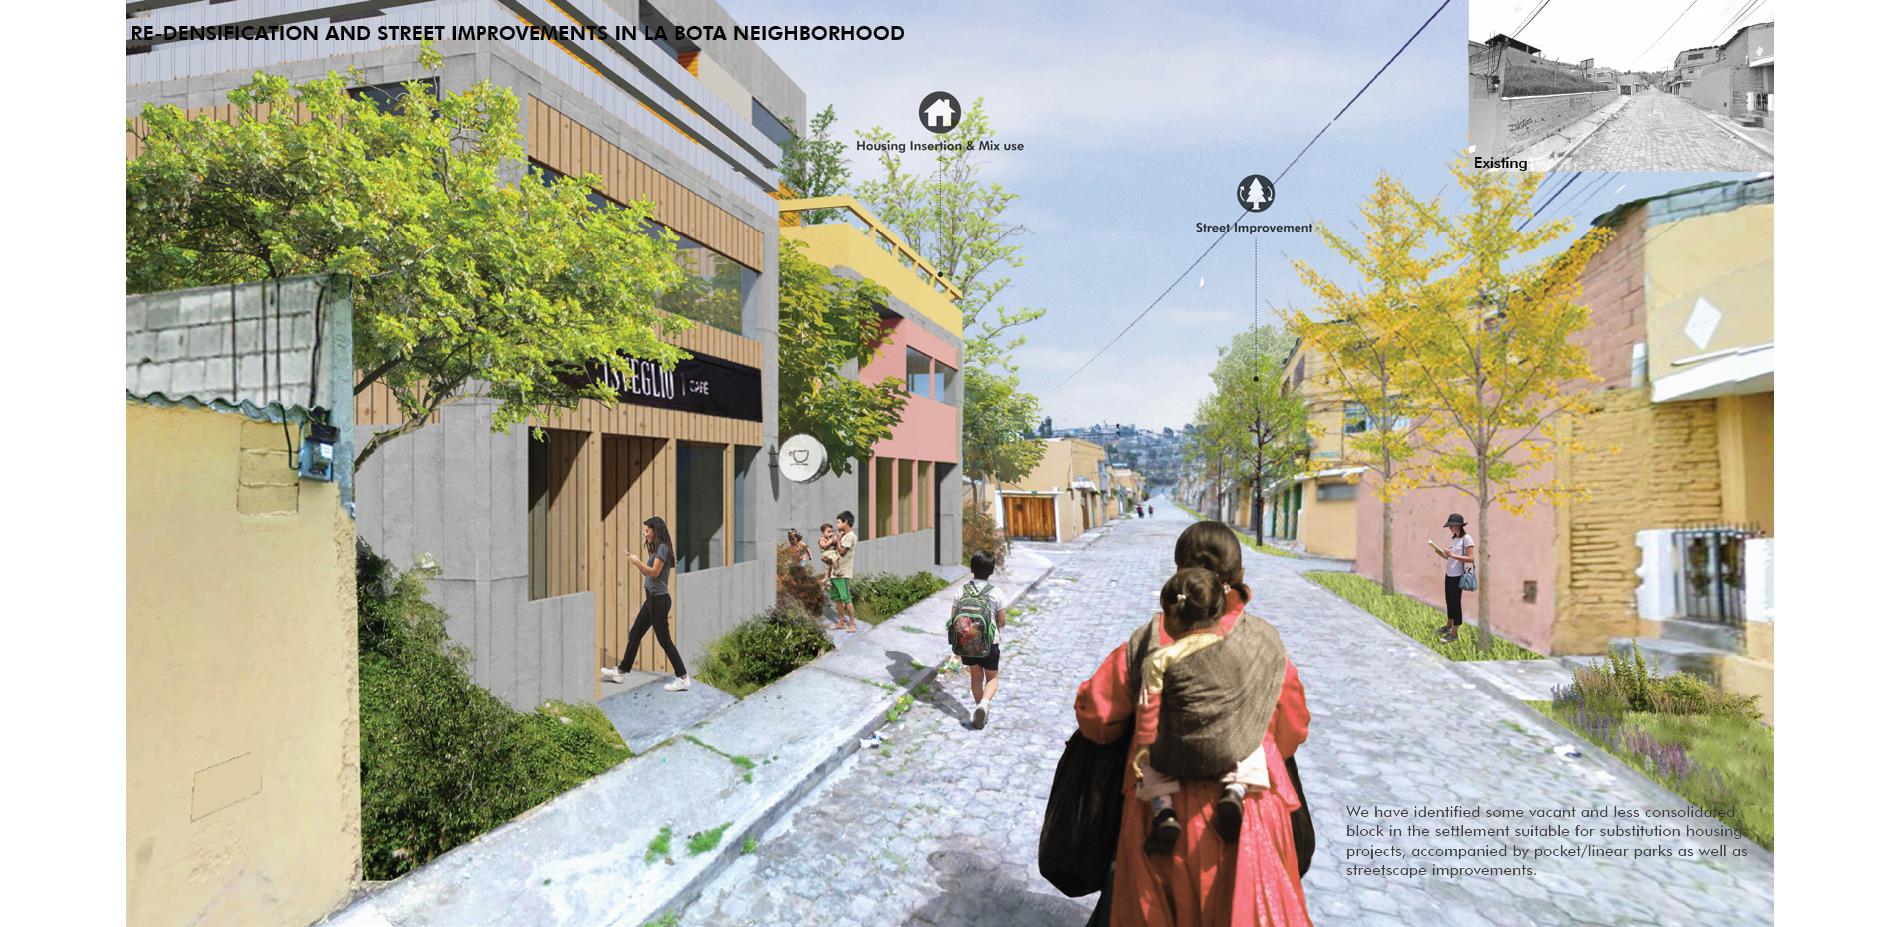 Re-Densification and Street Improvements in La Bota Neighborhood